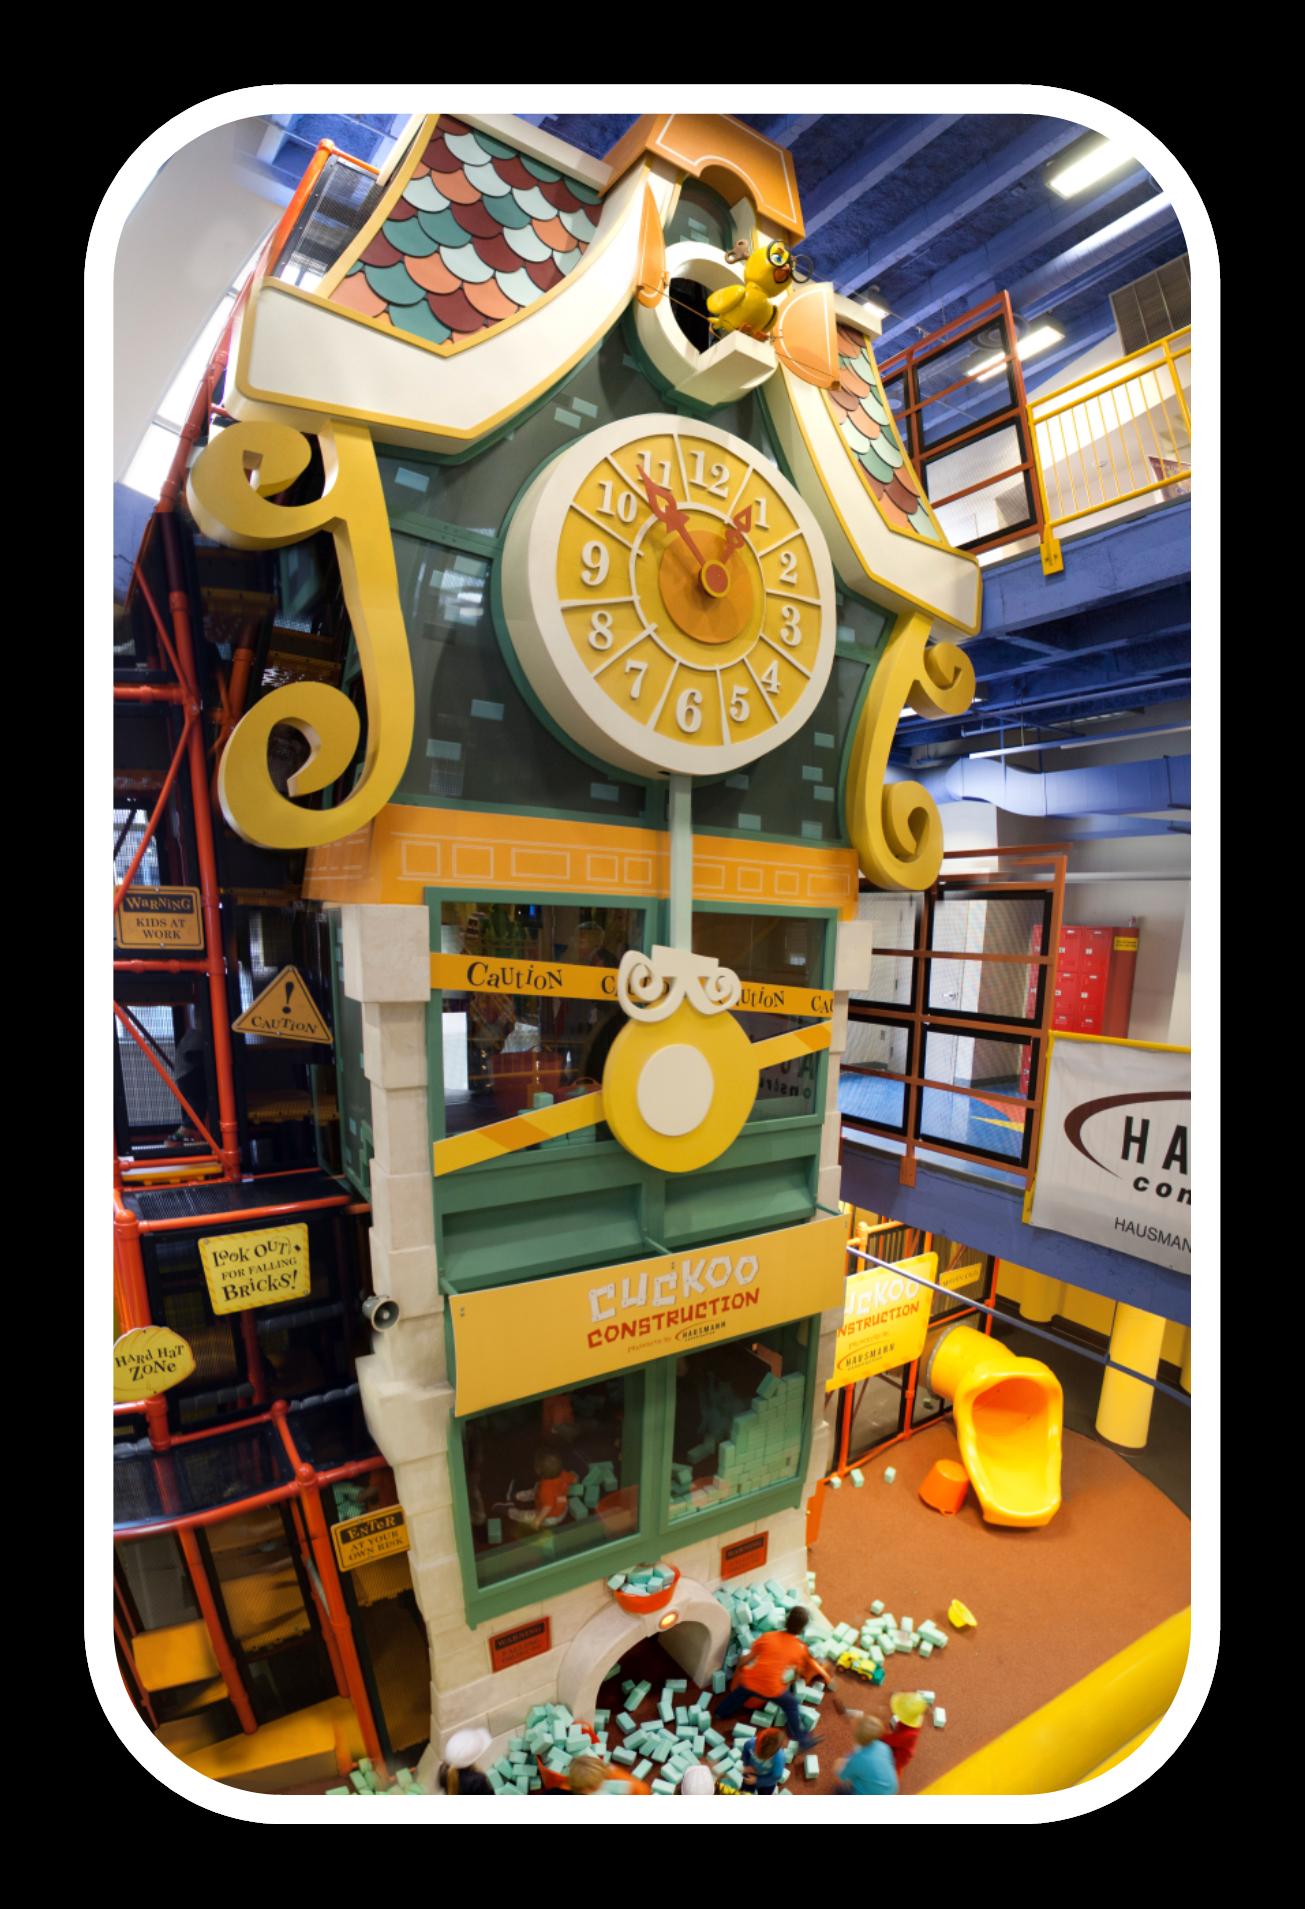 Hausmann Construction Cuckoo Construction Clock